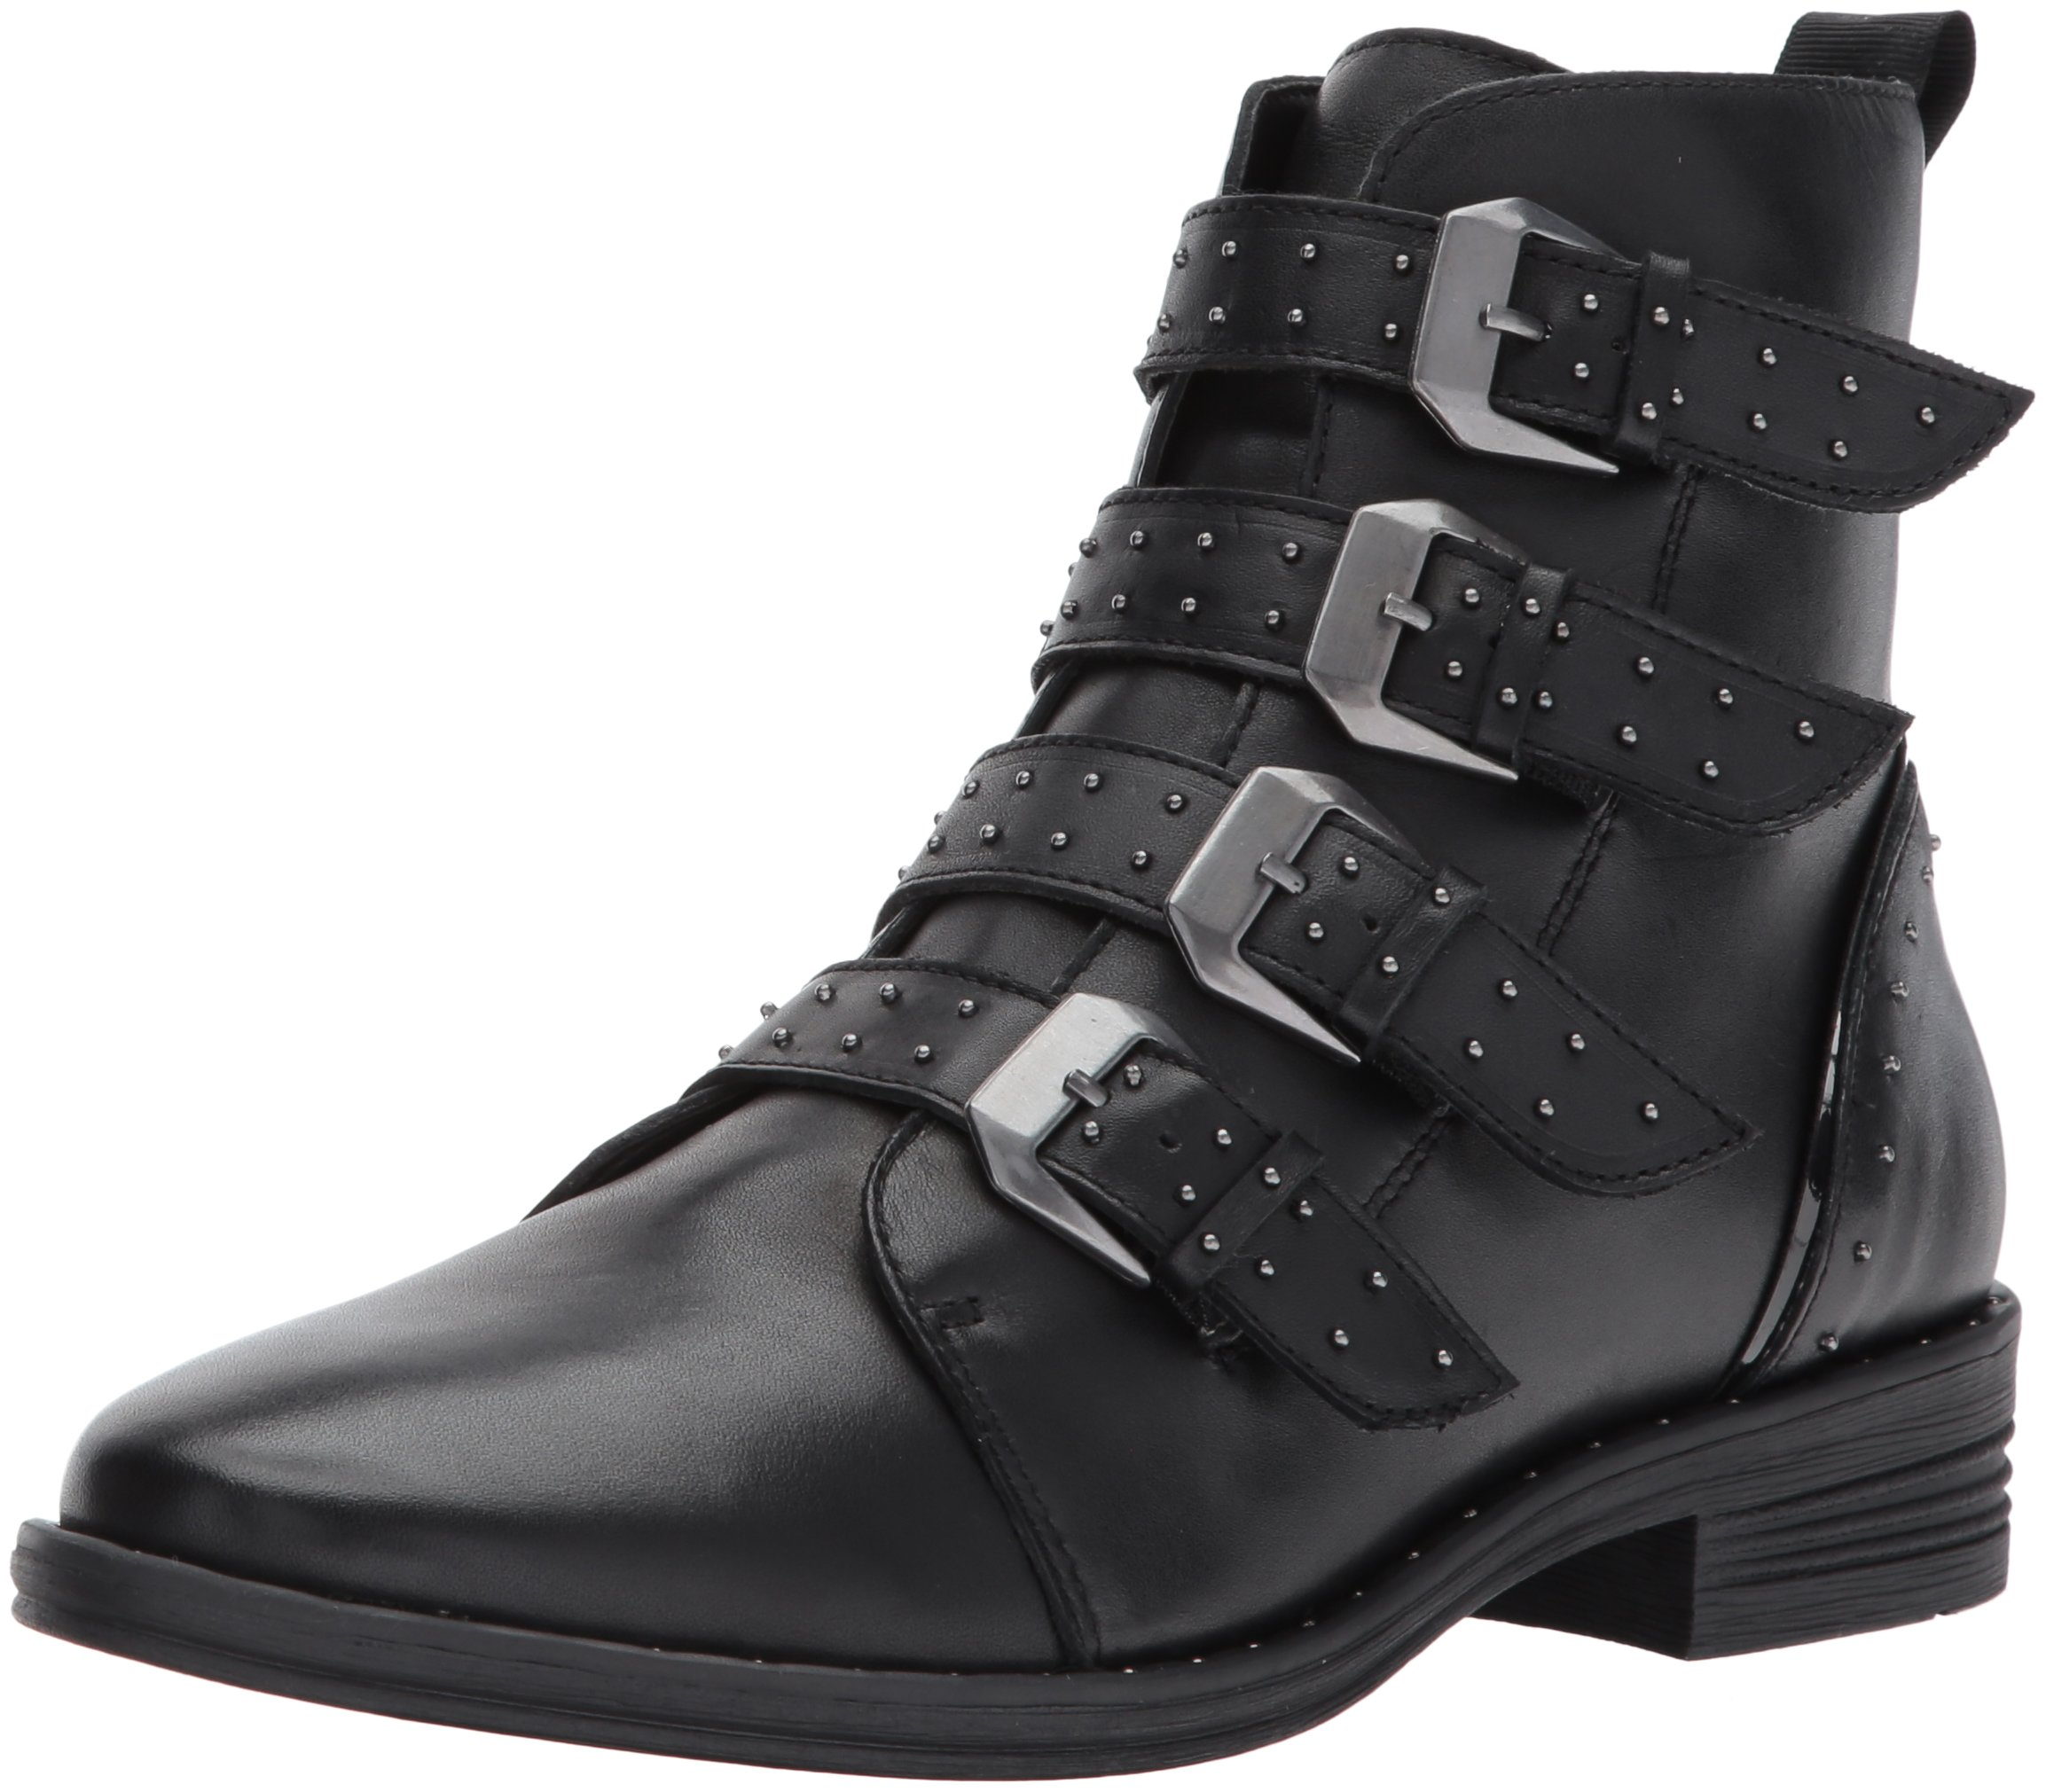 ویکالا · خرید  اصل اورجینال · خرید از آمازون · Steve Madden Women's Pursue Motorcycle Boot, Black Leather, 8.5 M US wekala · ویکالا